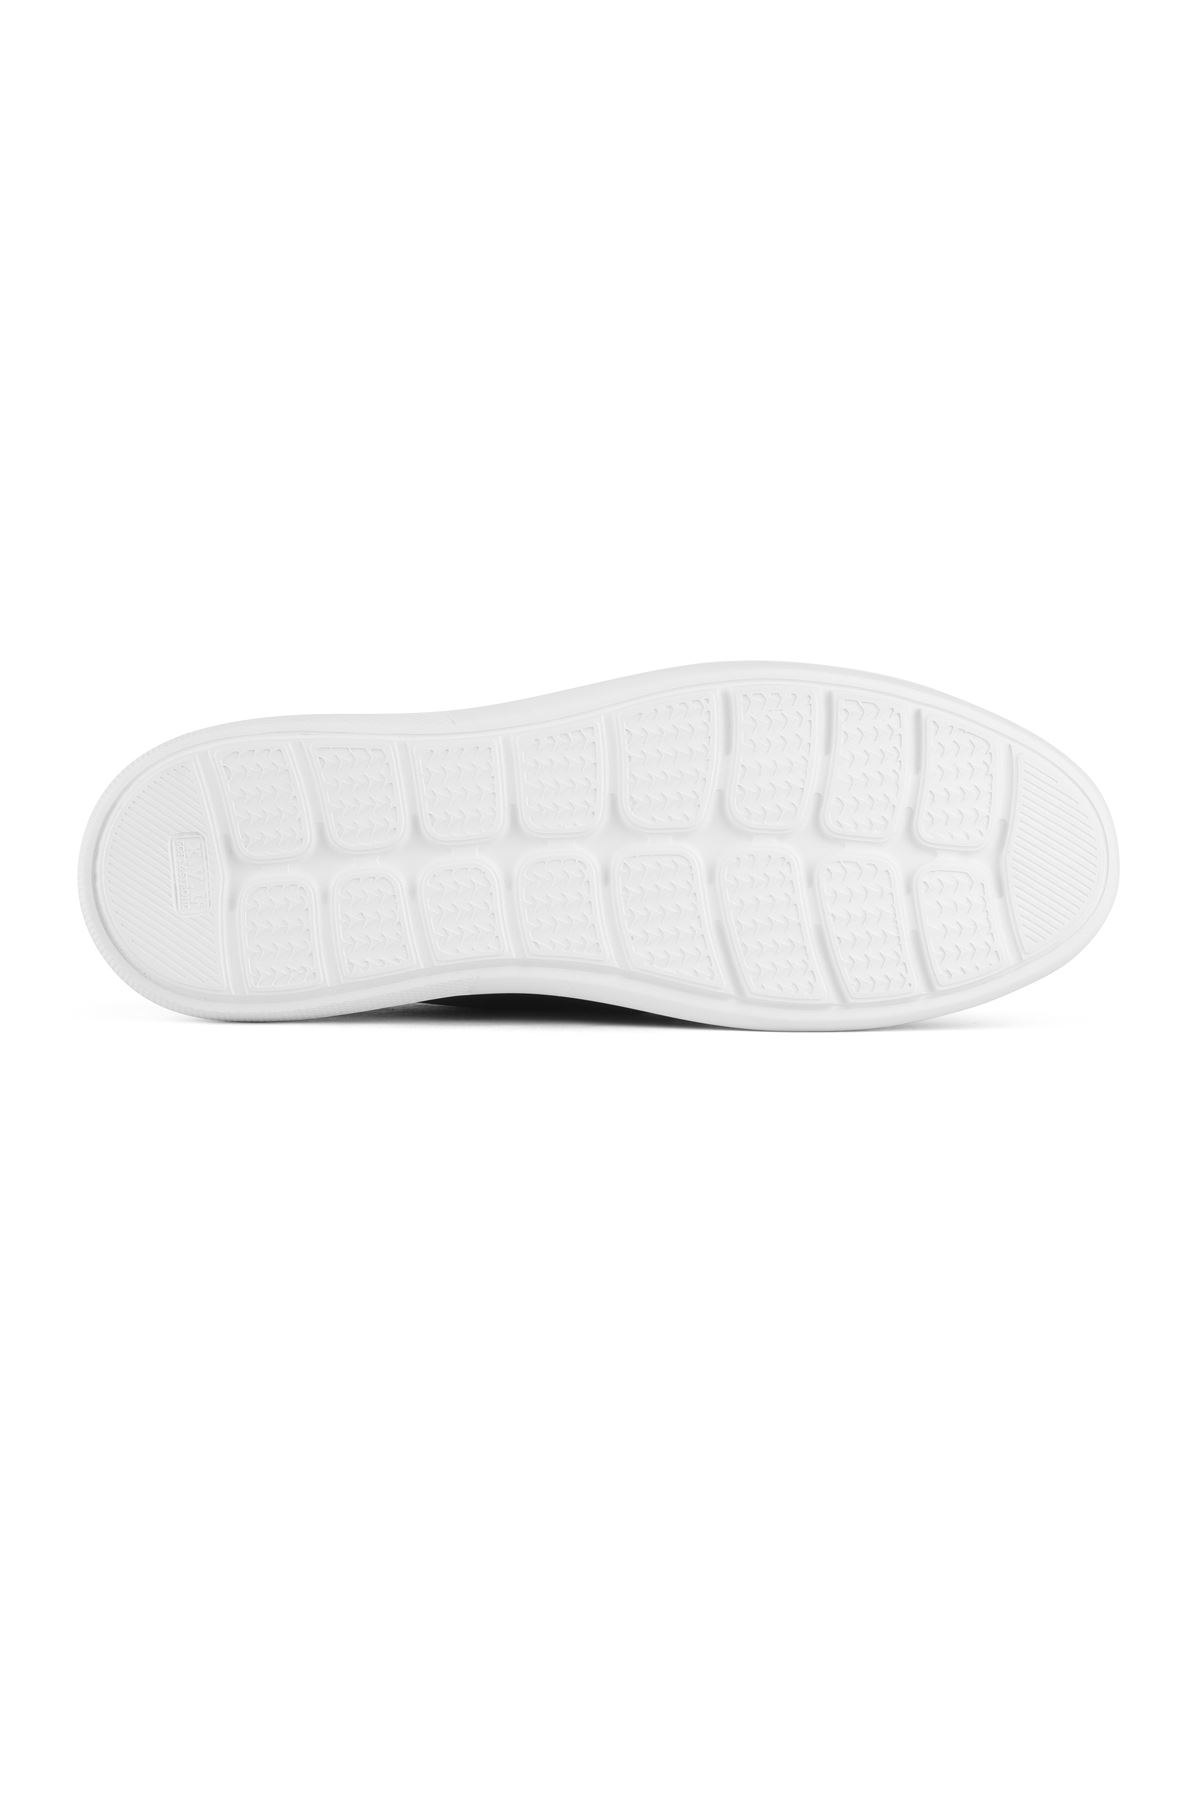 Libero 3332 Black Loafer Shoes